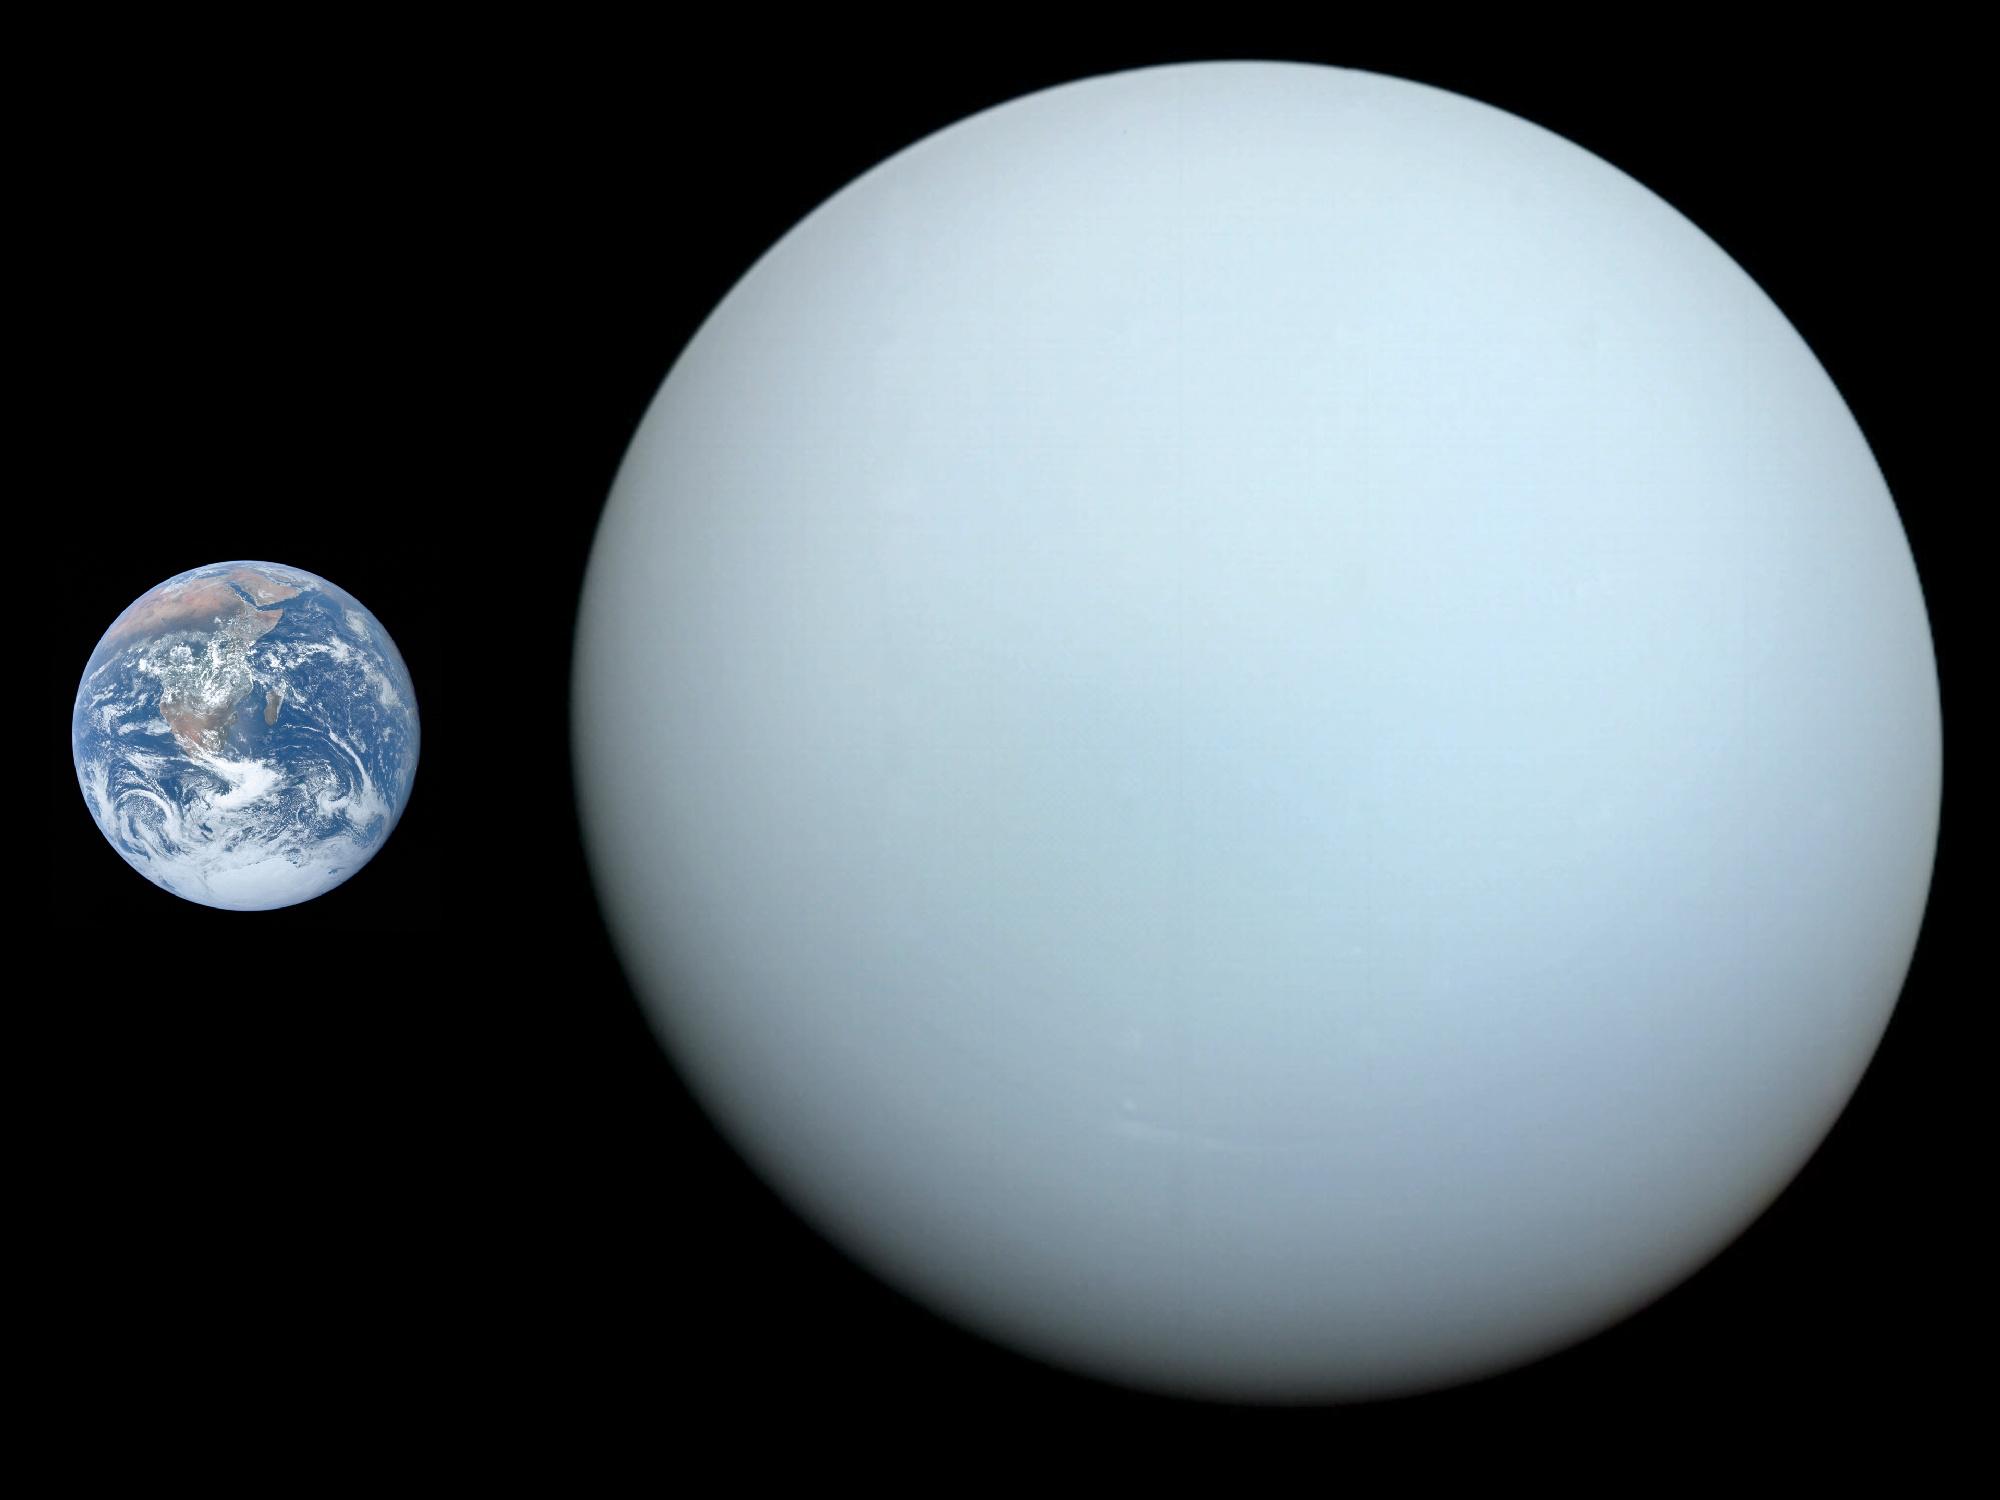 Uranus and Earth